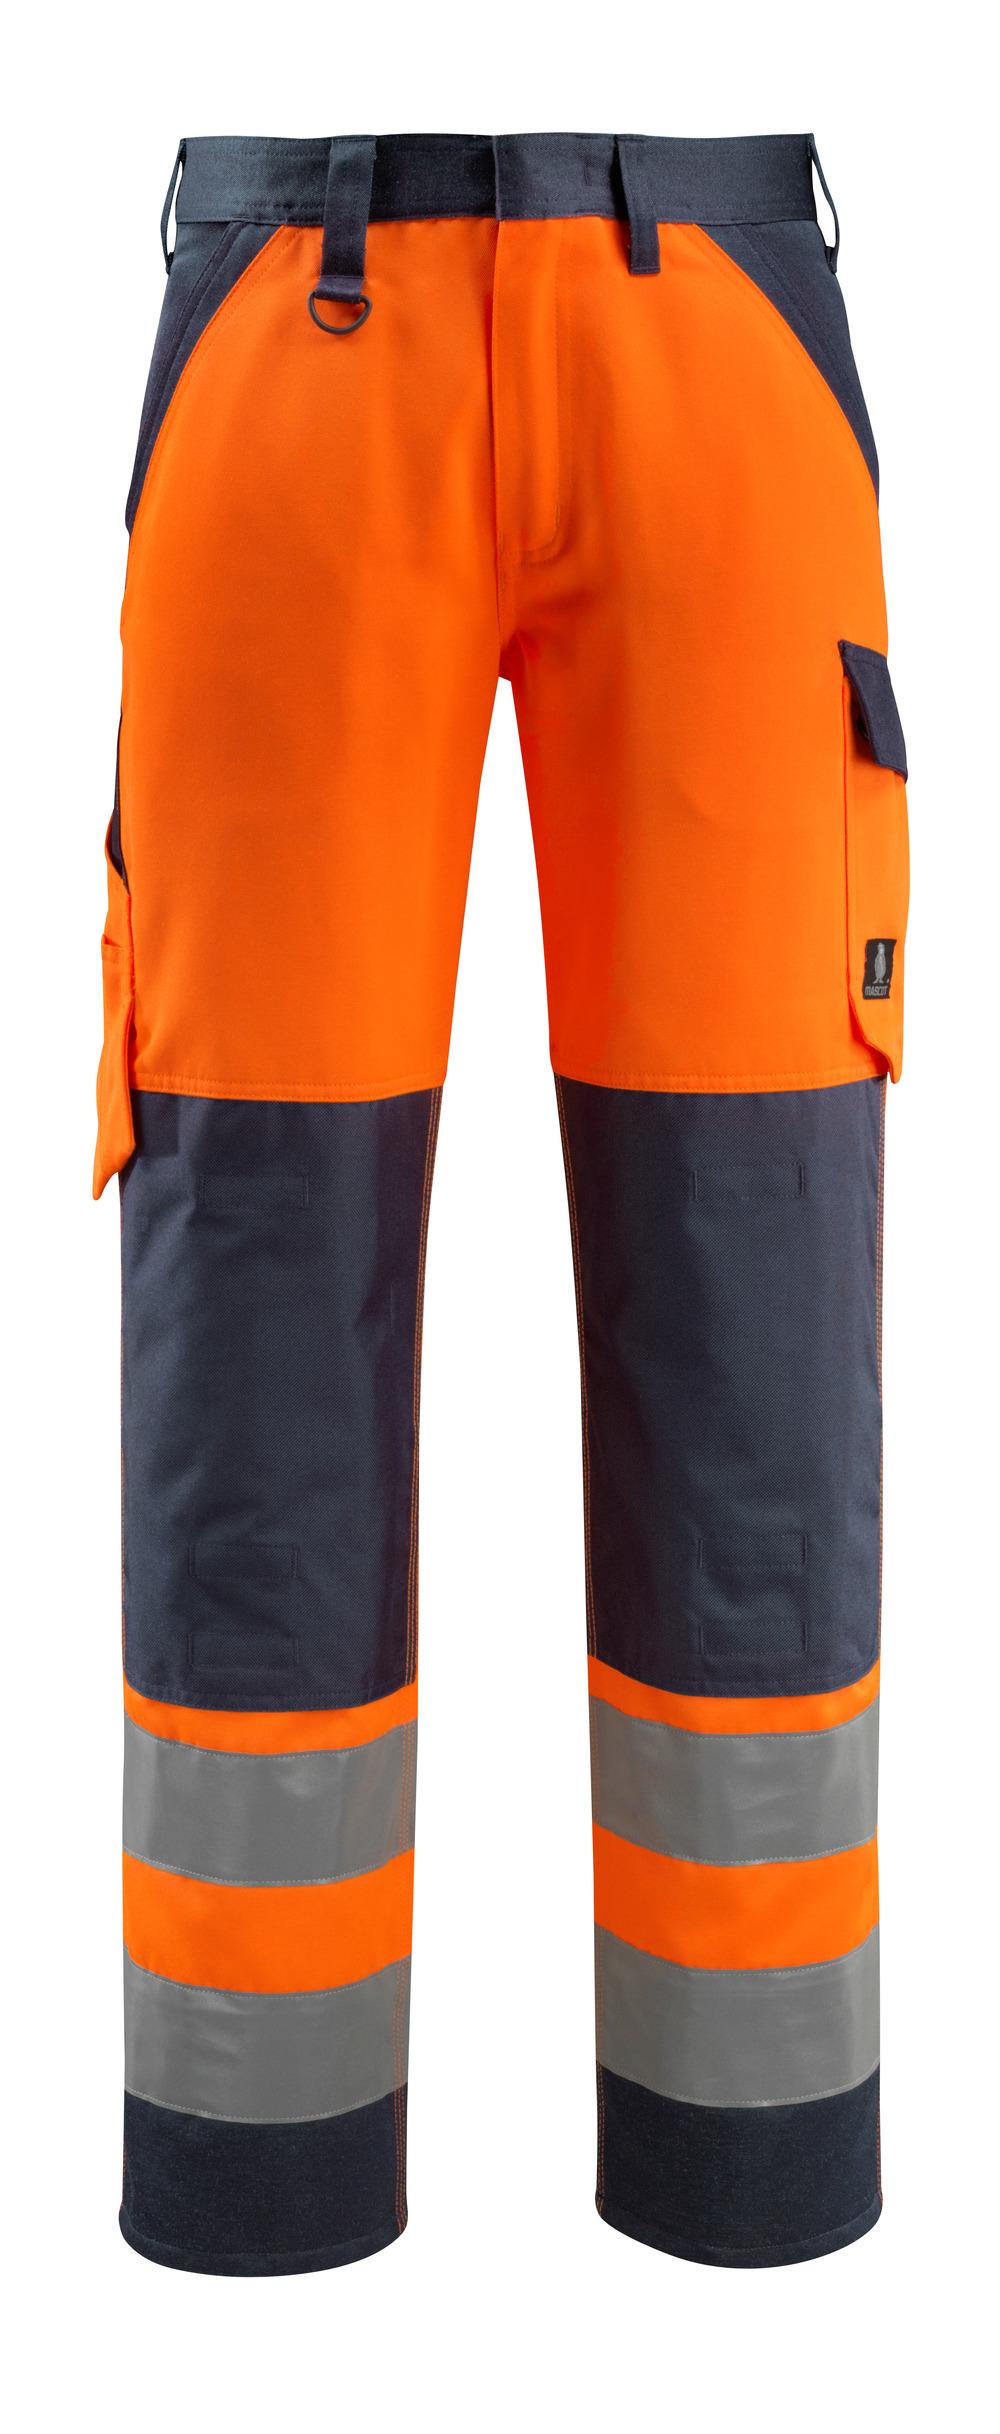 15979-948-14010 Arbeitshose - hi-vis Orange/Schwarzblau